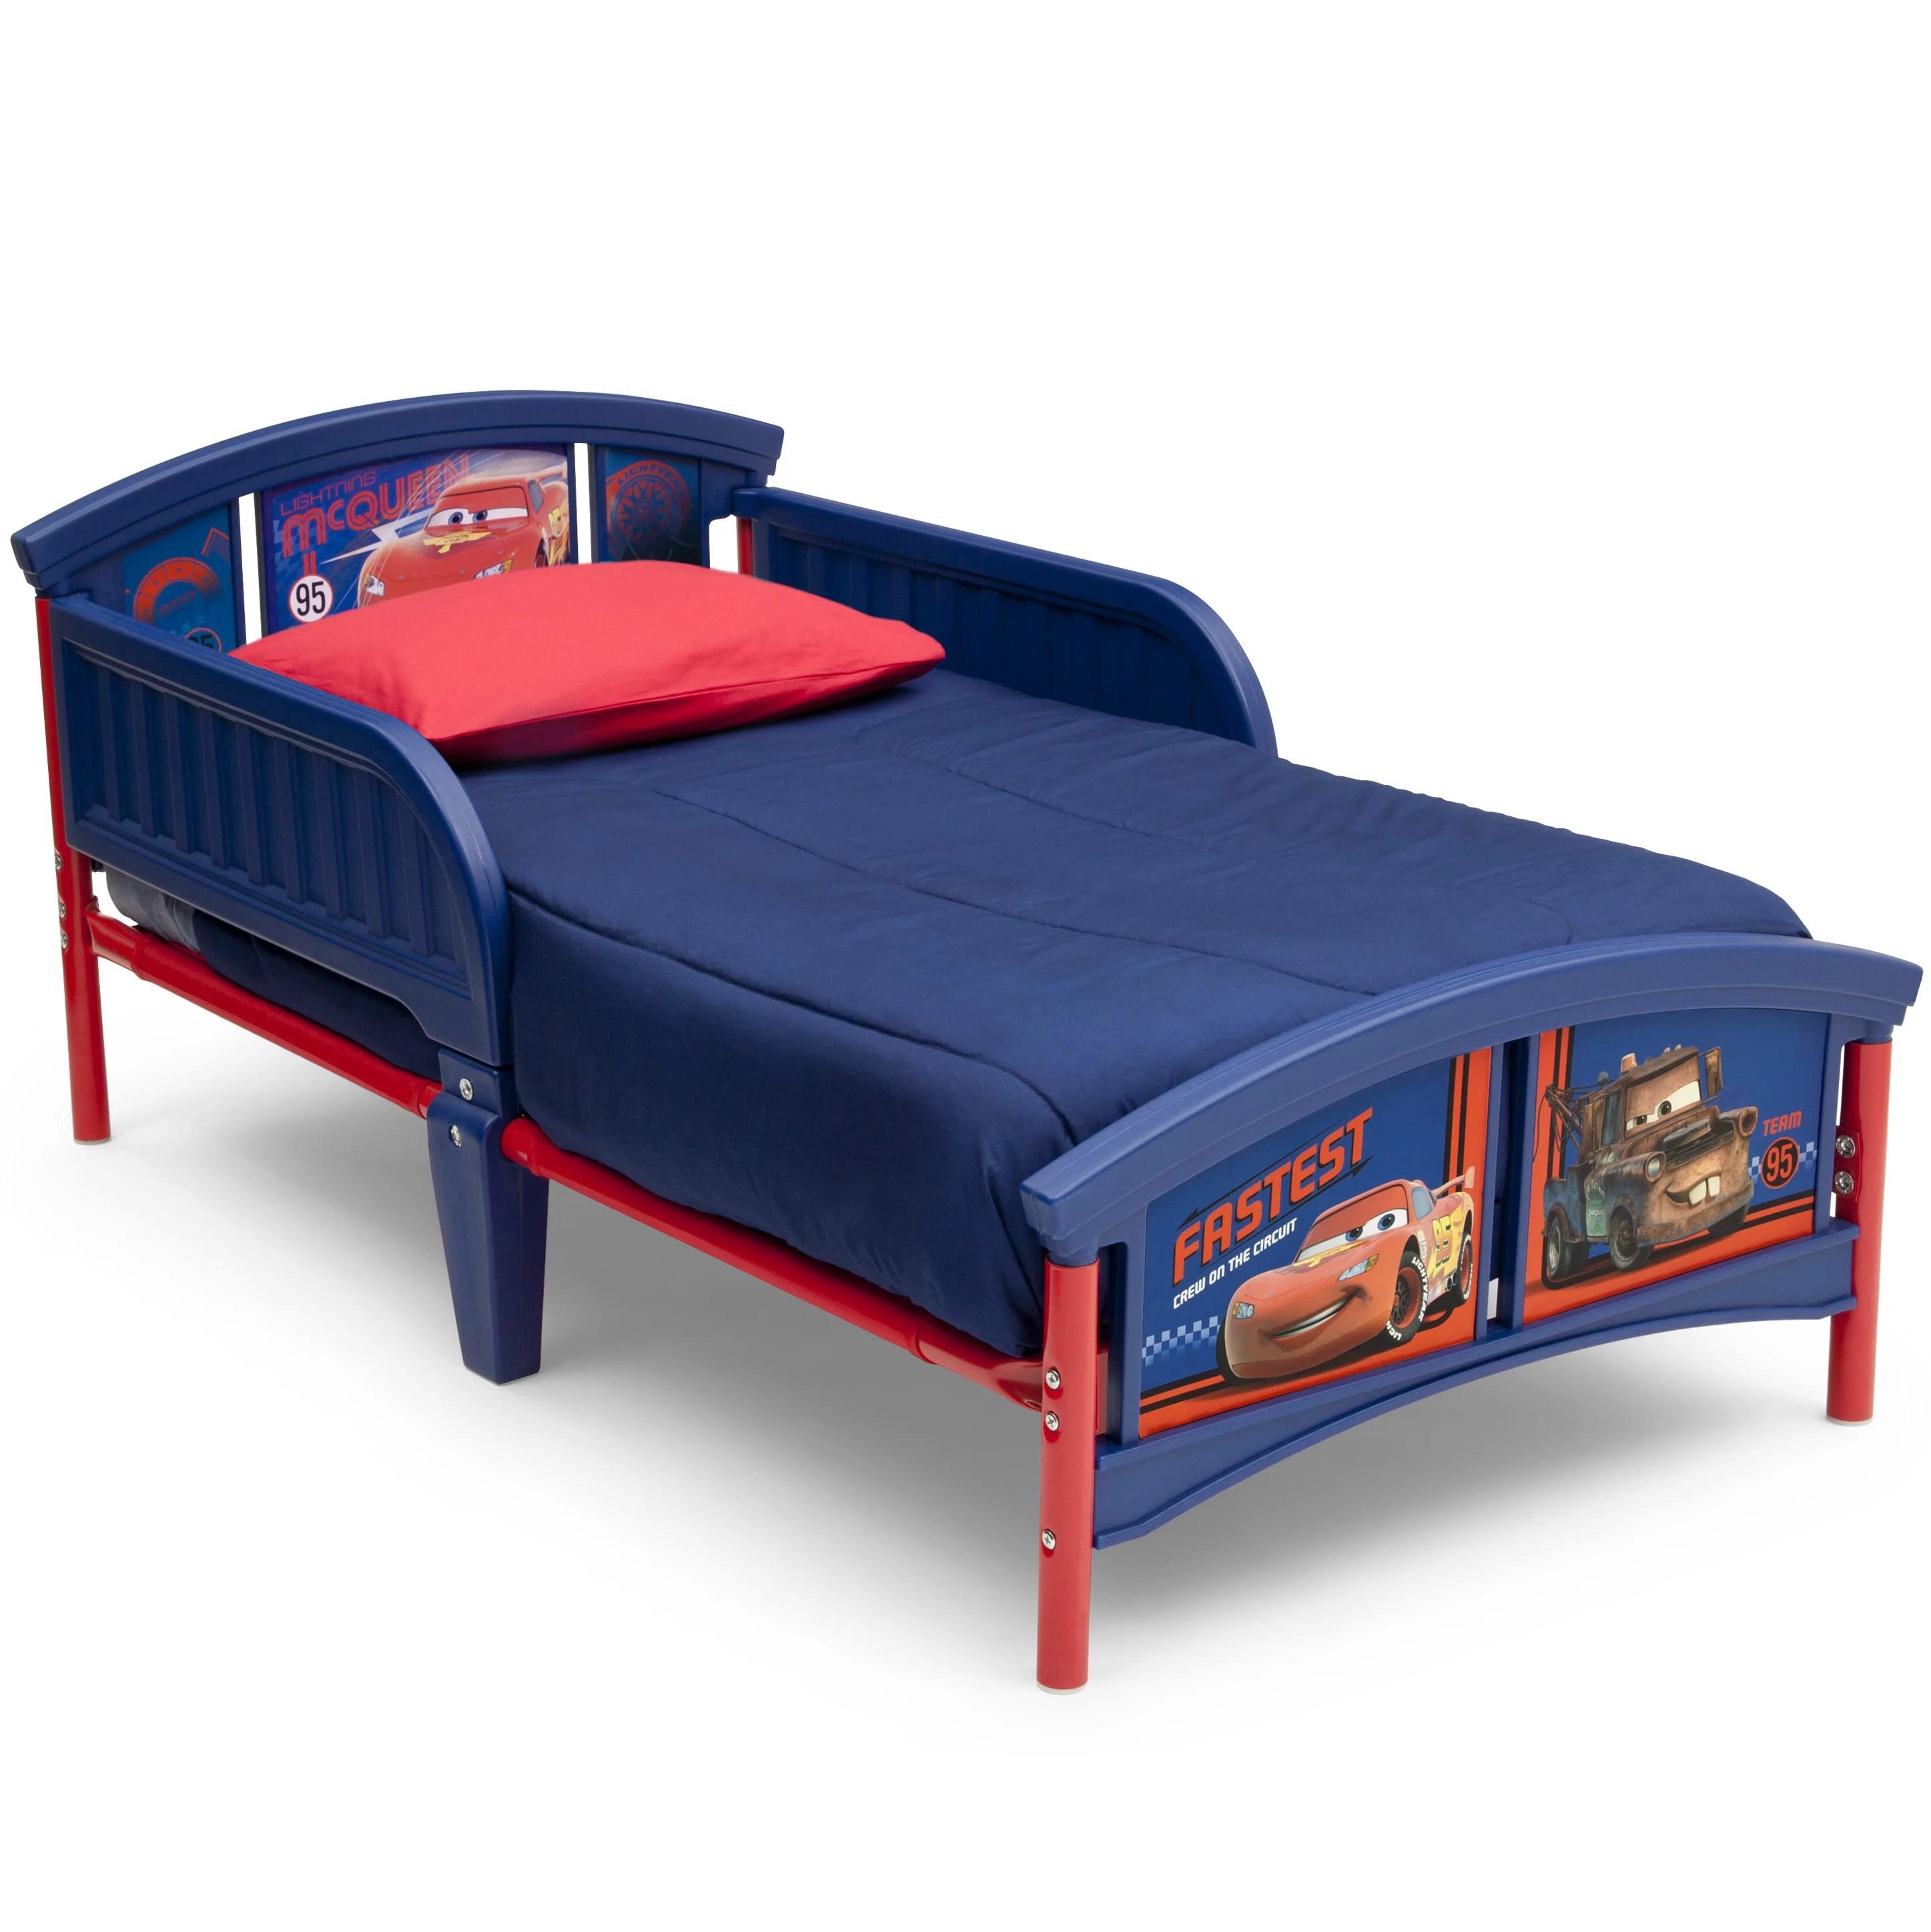 Disney Pixar Cars Plastic Toddler Bed Best Character